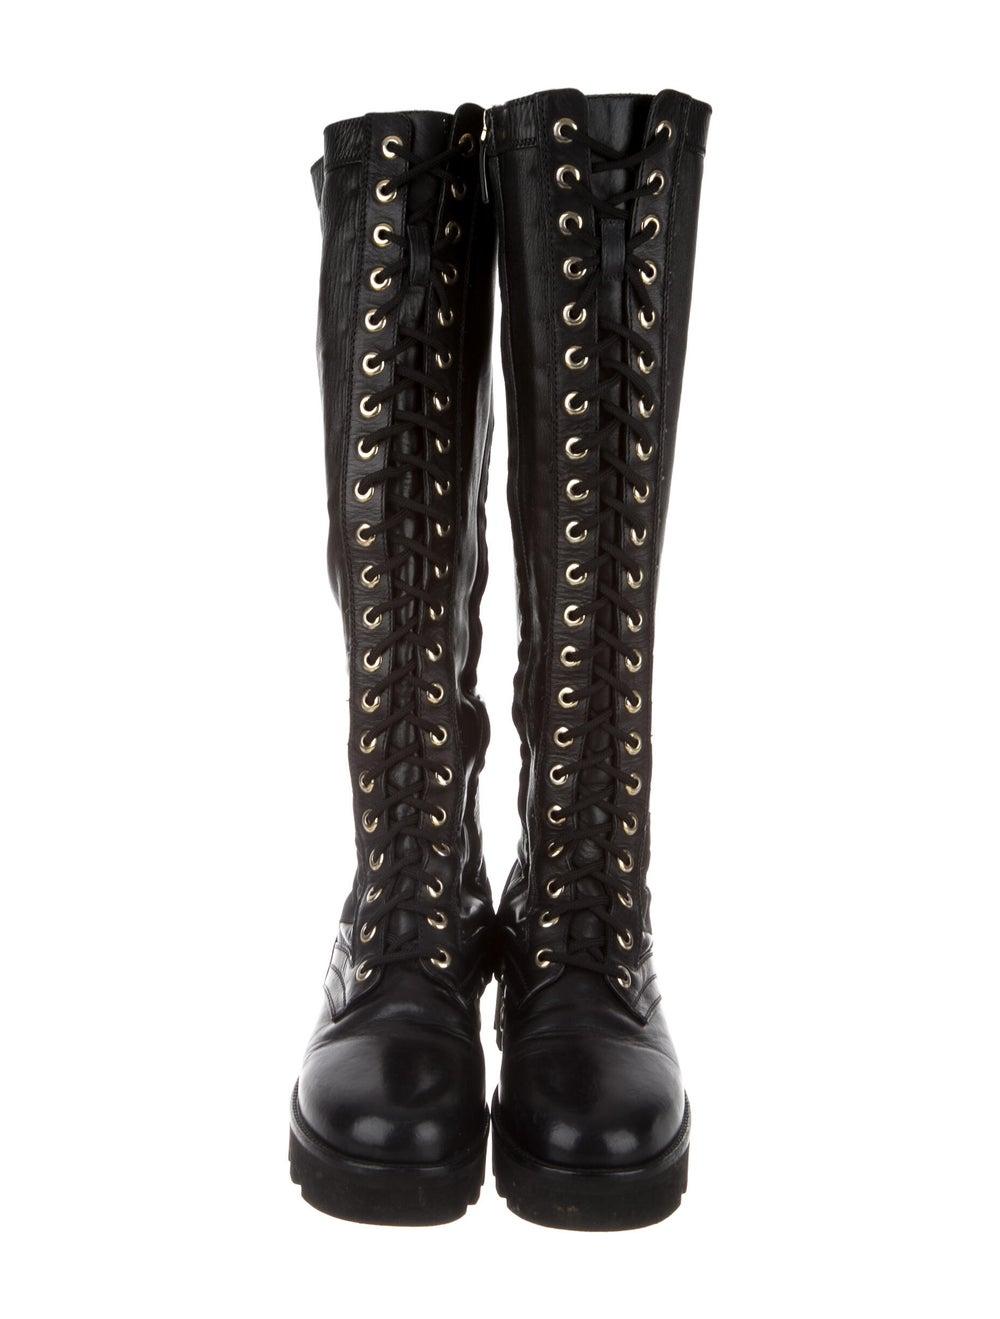 Altuzarra Leather Combat Boots Black - image 3